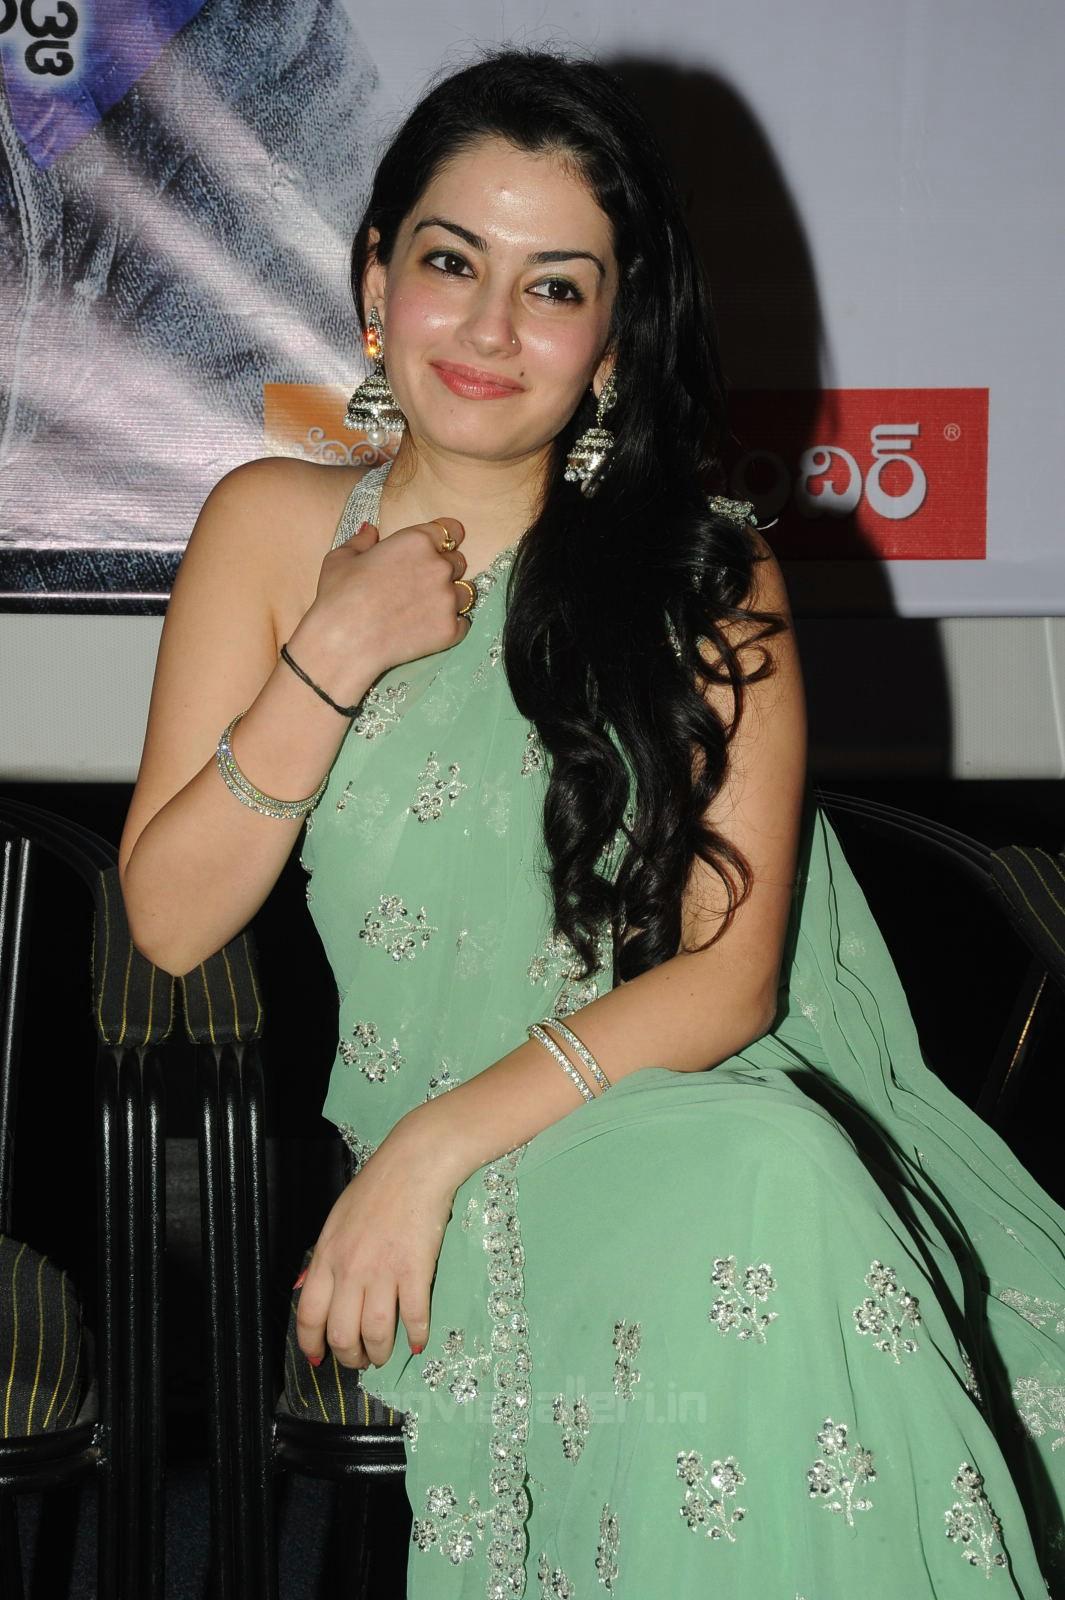 Anushka Shetty Cute Wallpapers Telugu Actress Shambhavi New Hot Photos Shambhavi Hot